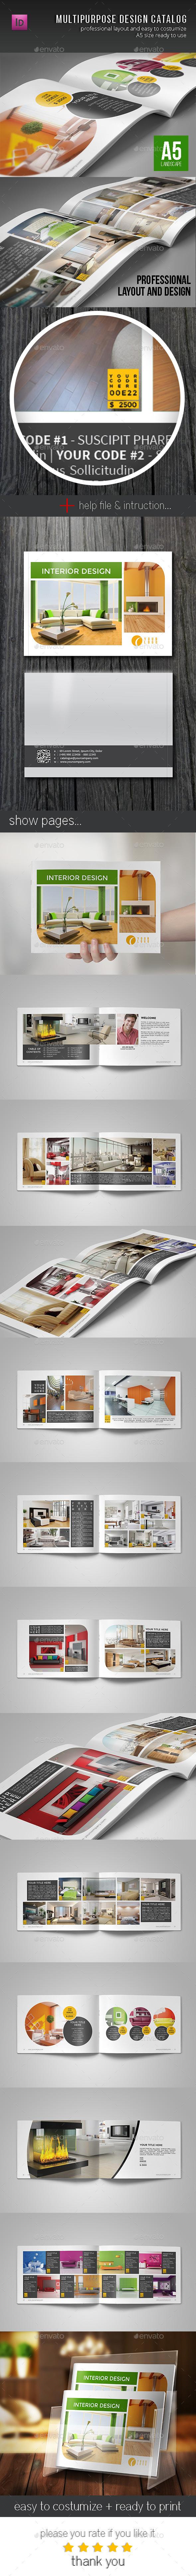 GraphicRiver Brochure Catalog Template 10856112